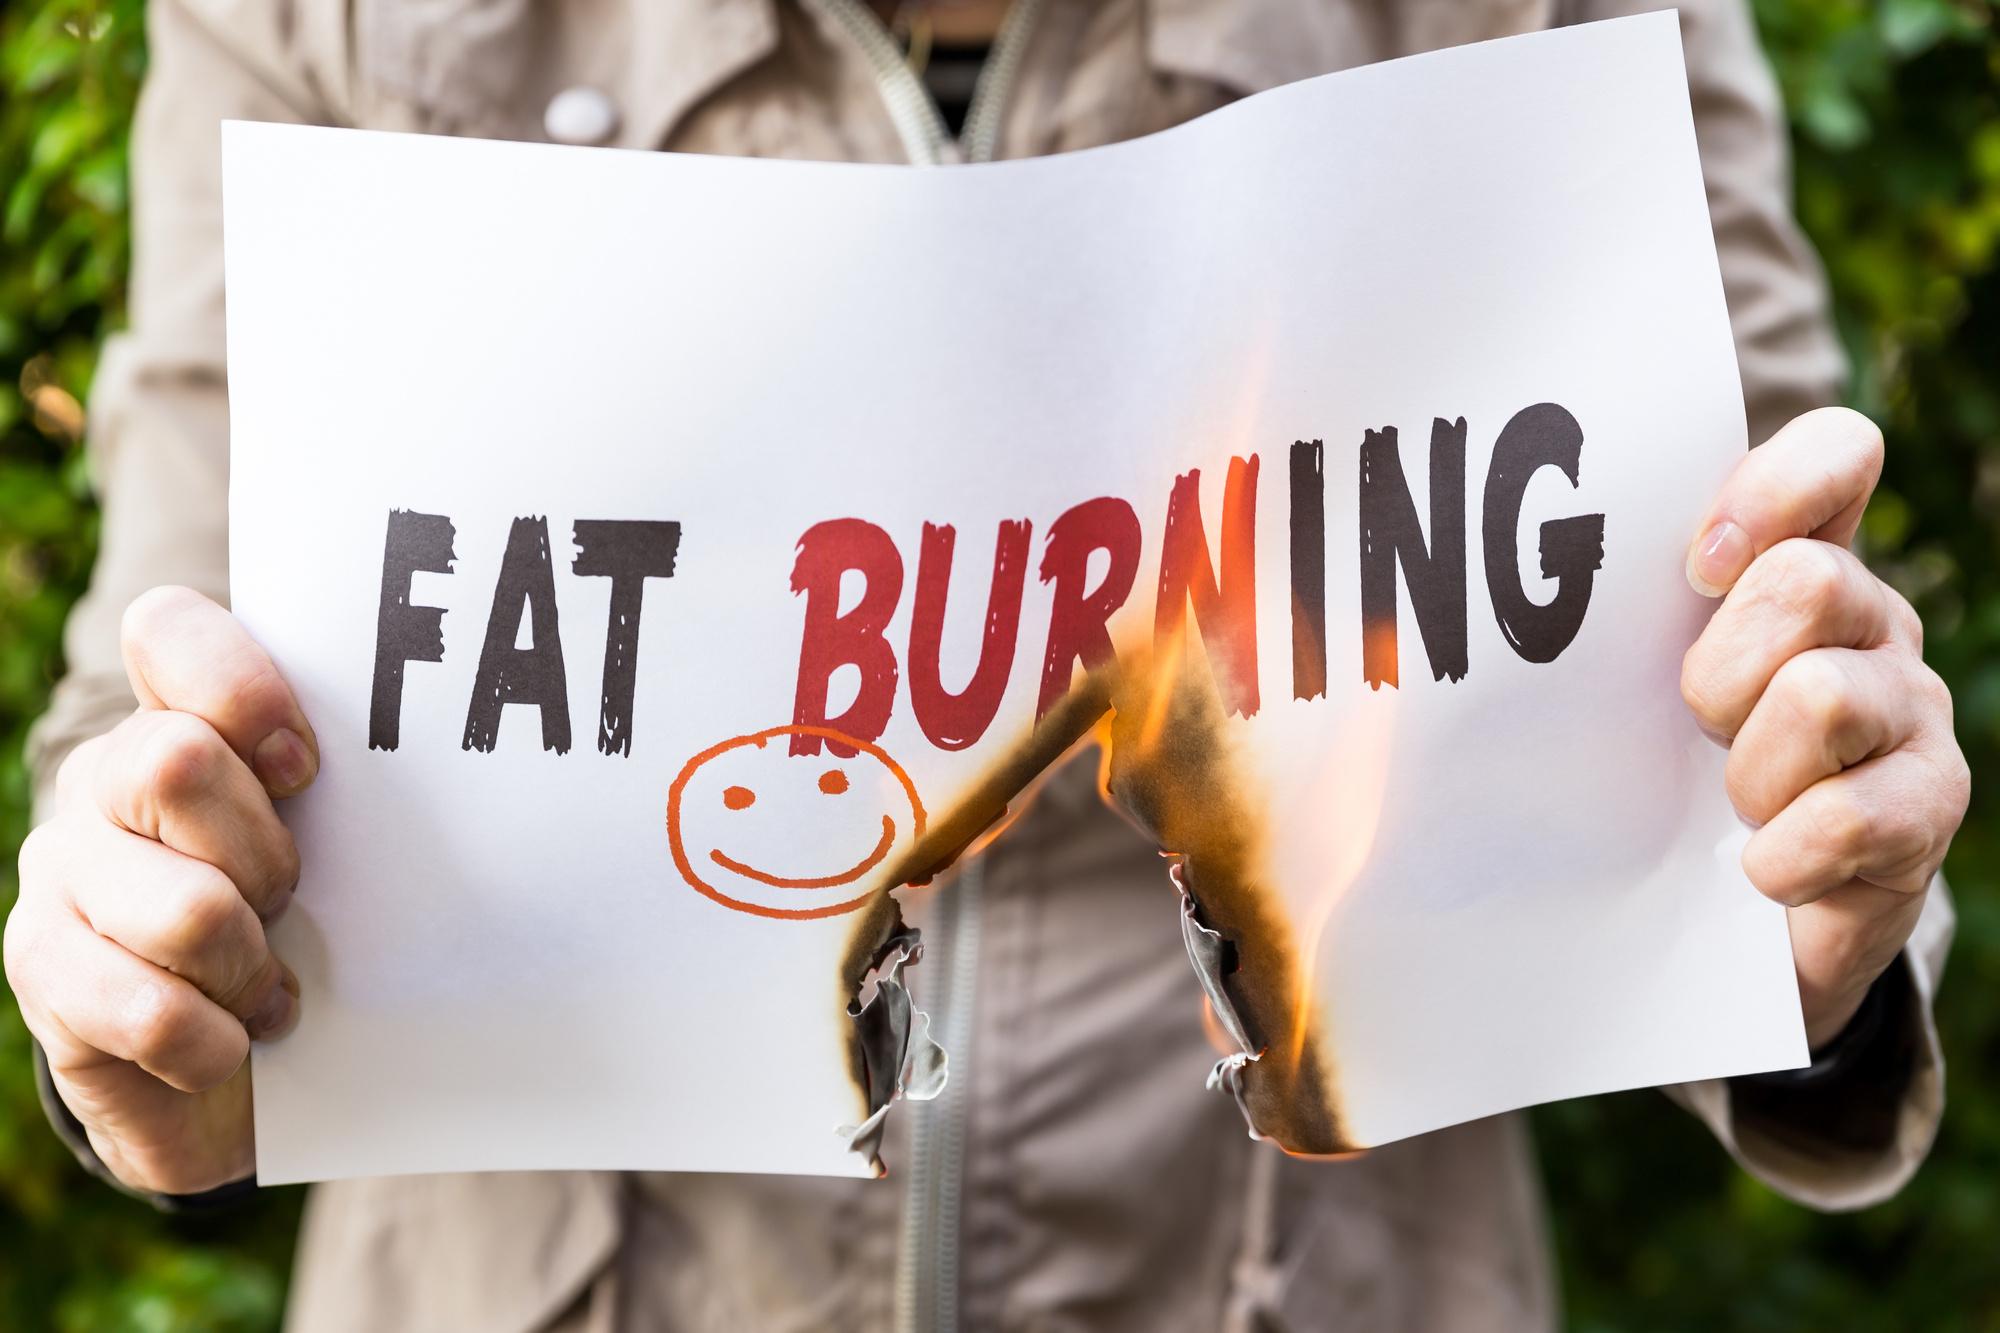 fat burning foods.jpeg